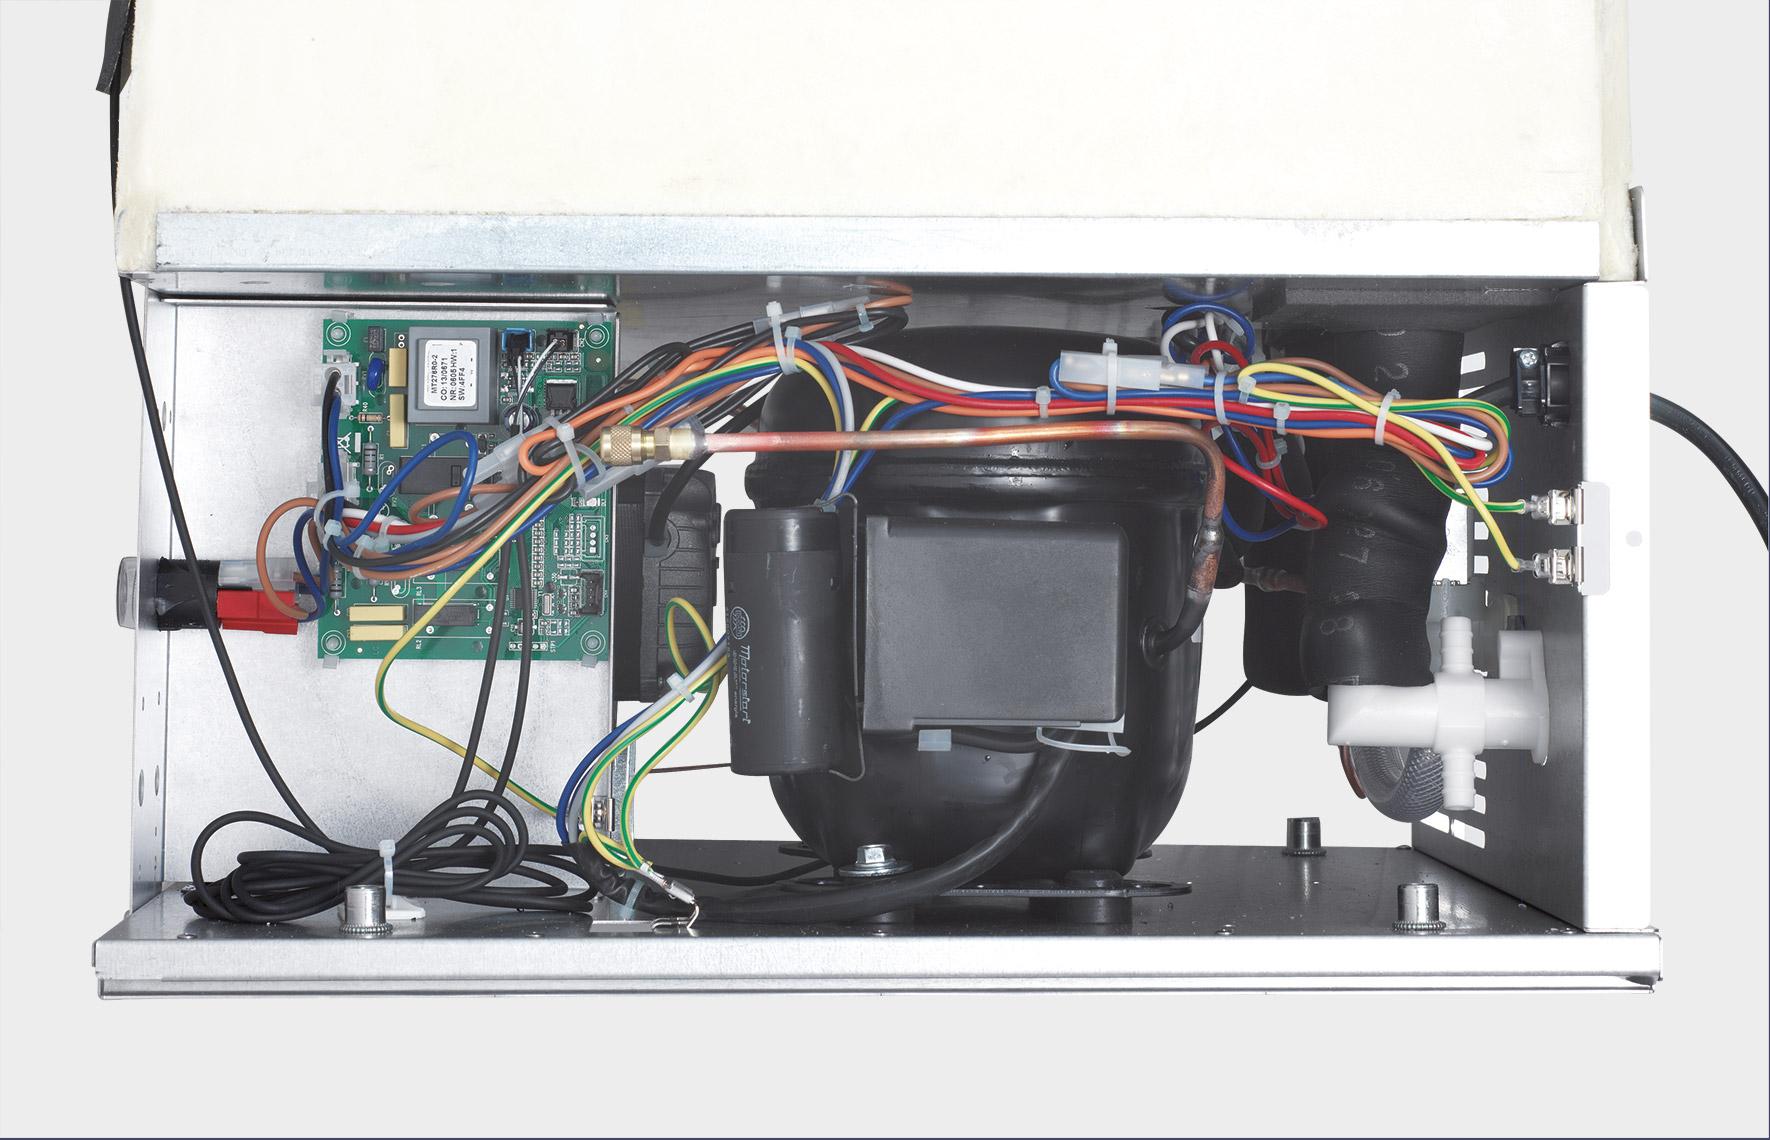 Self-test electronic control